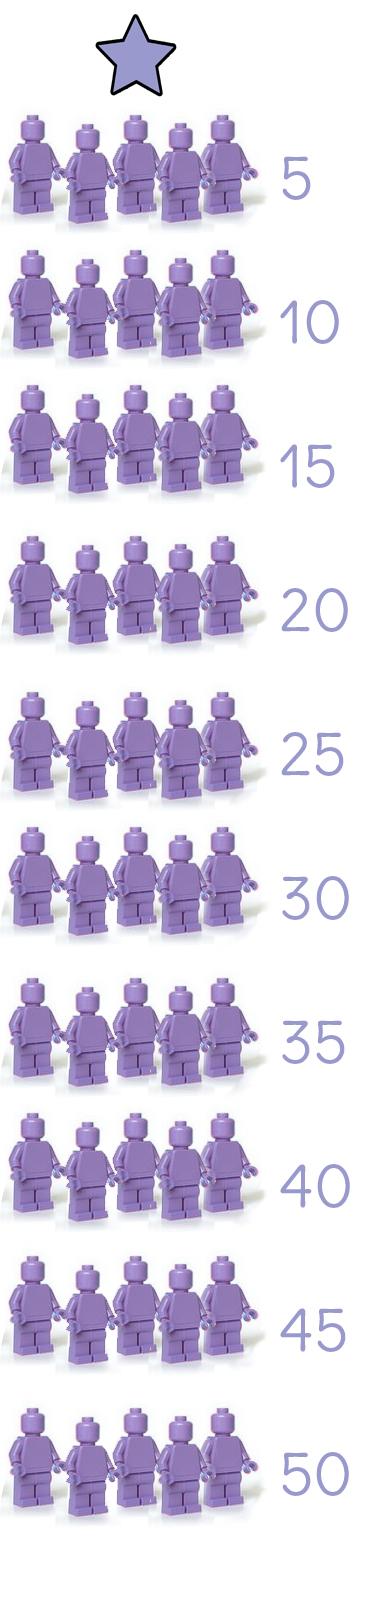 Tafel van 5 leren met LEGO | AS ! | Pinterest | Mathe uhr, Mathe und ...